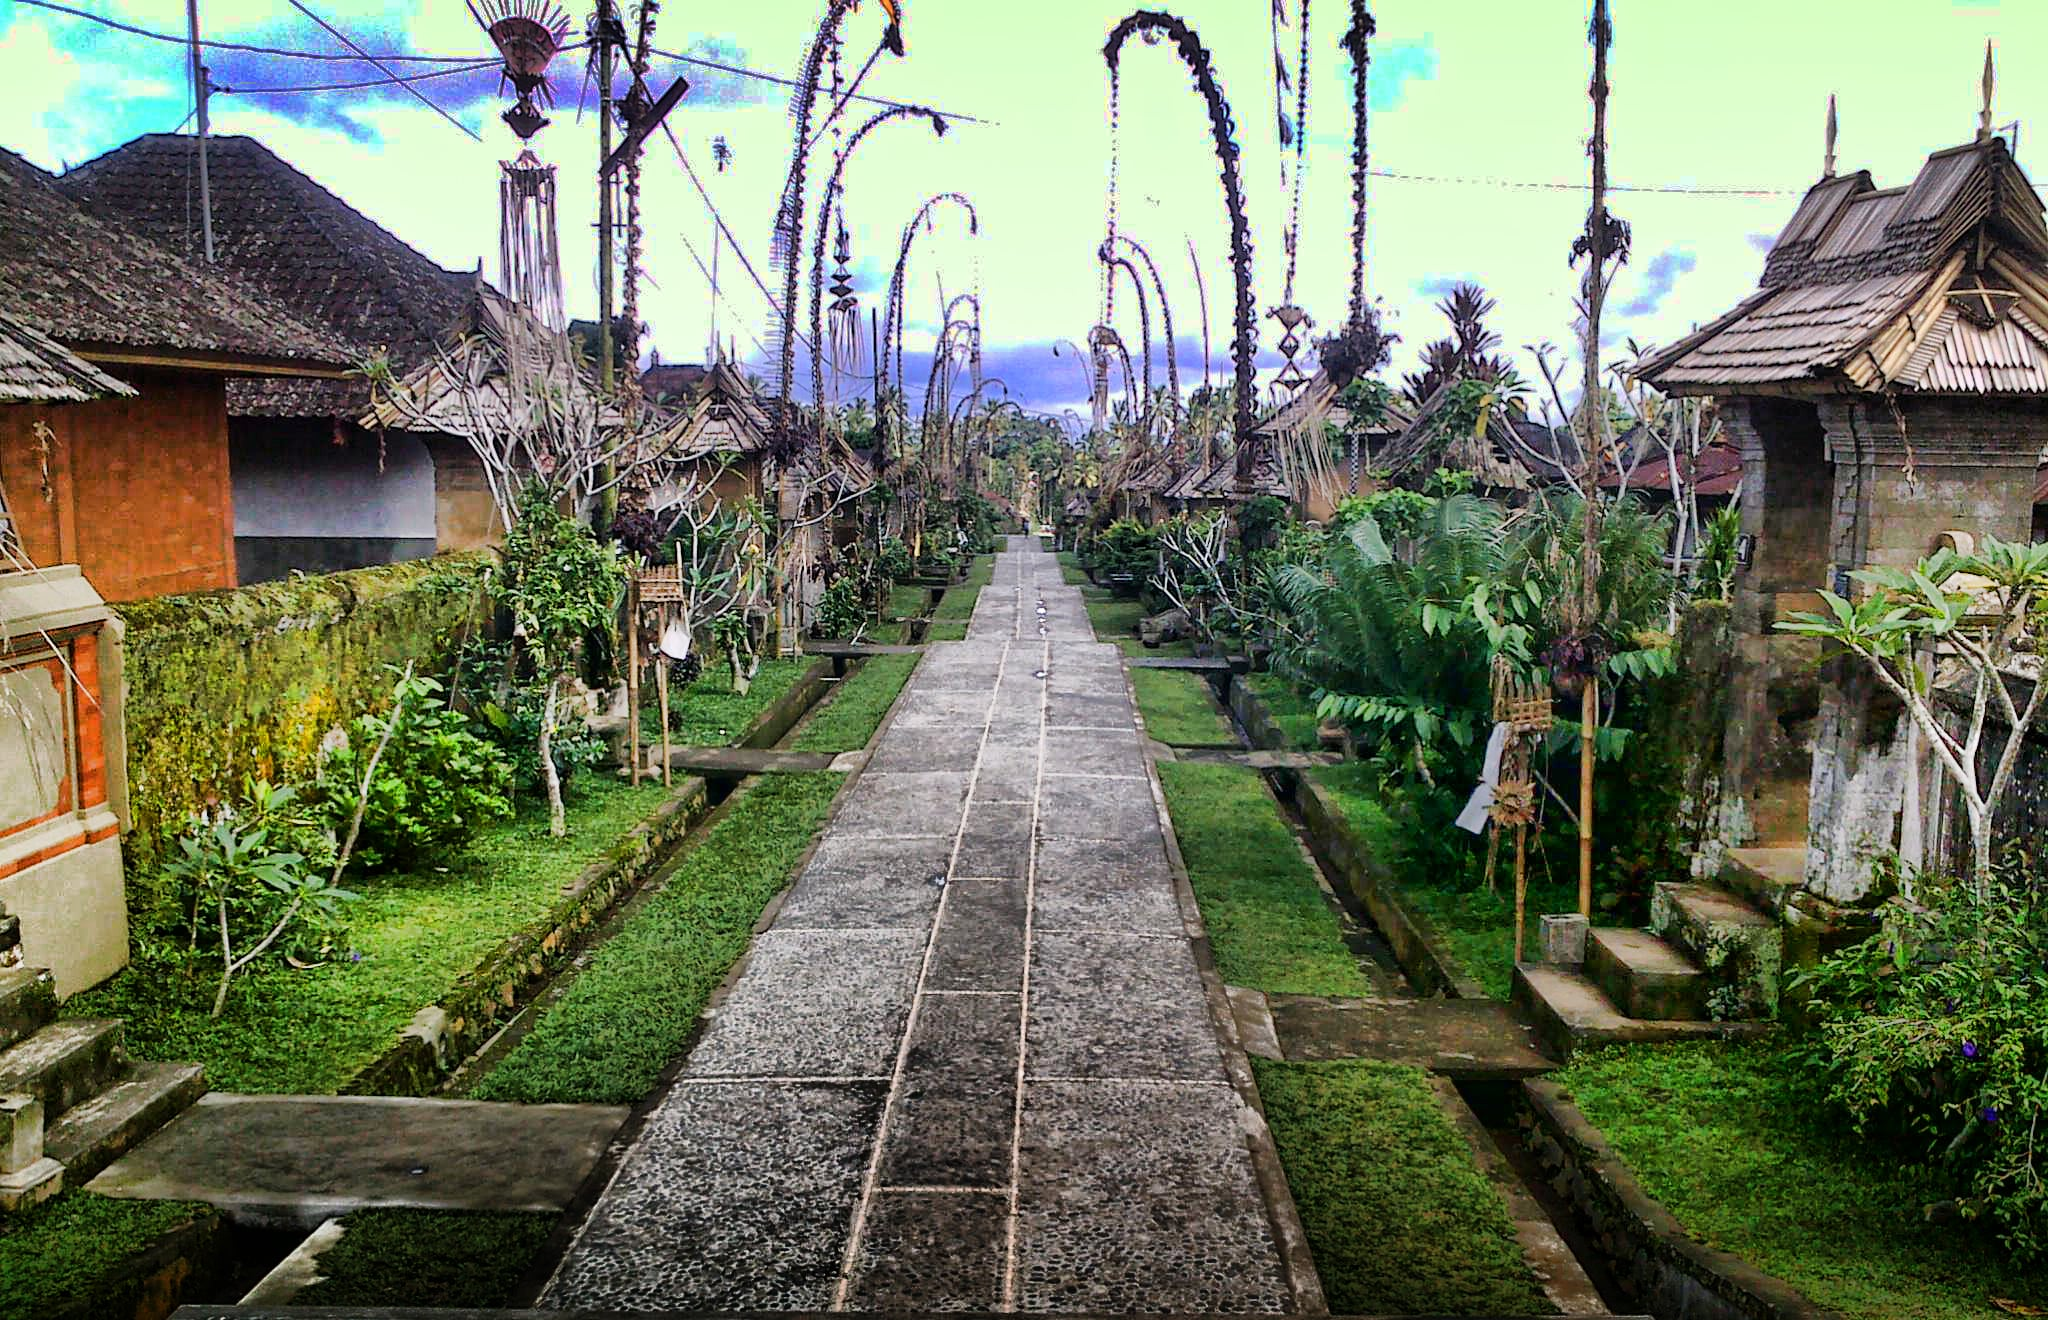 balis-mount-batur-penglipuran-village-secret-world